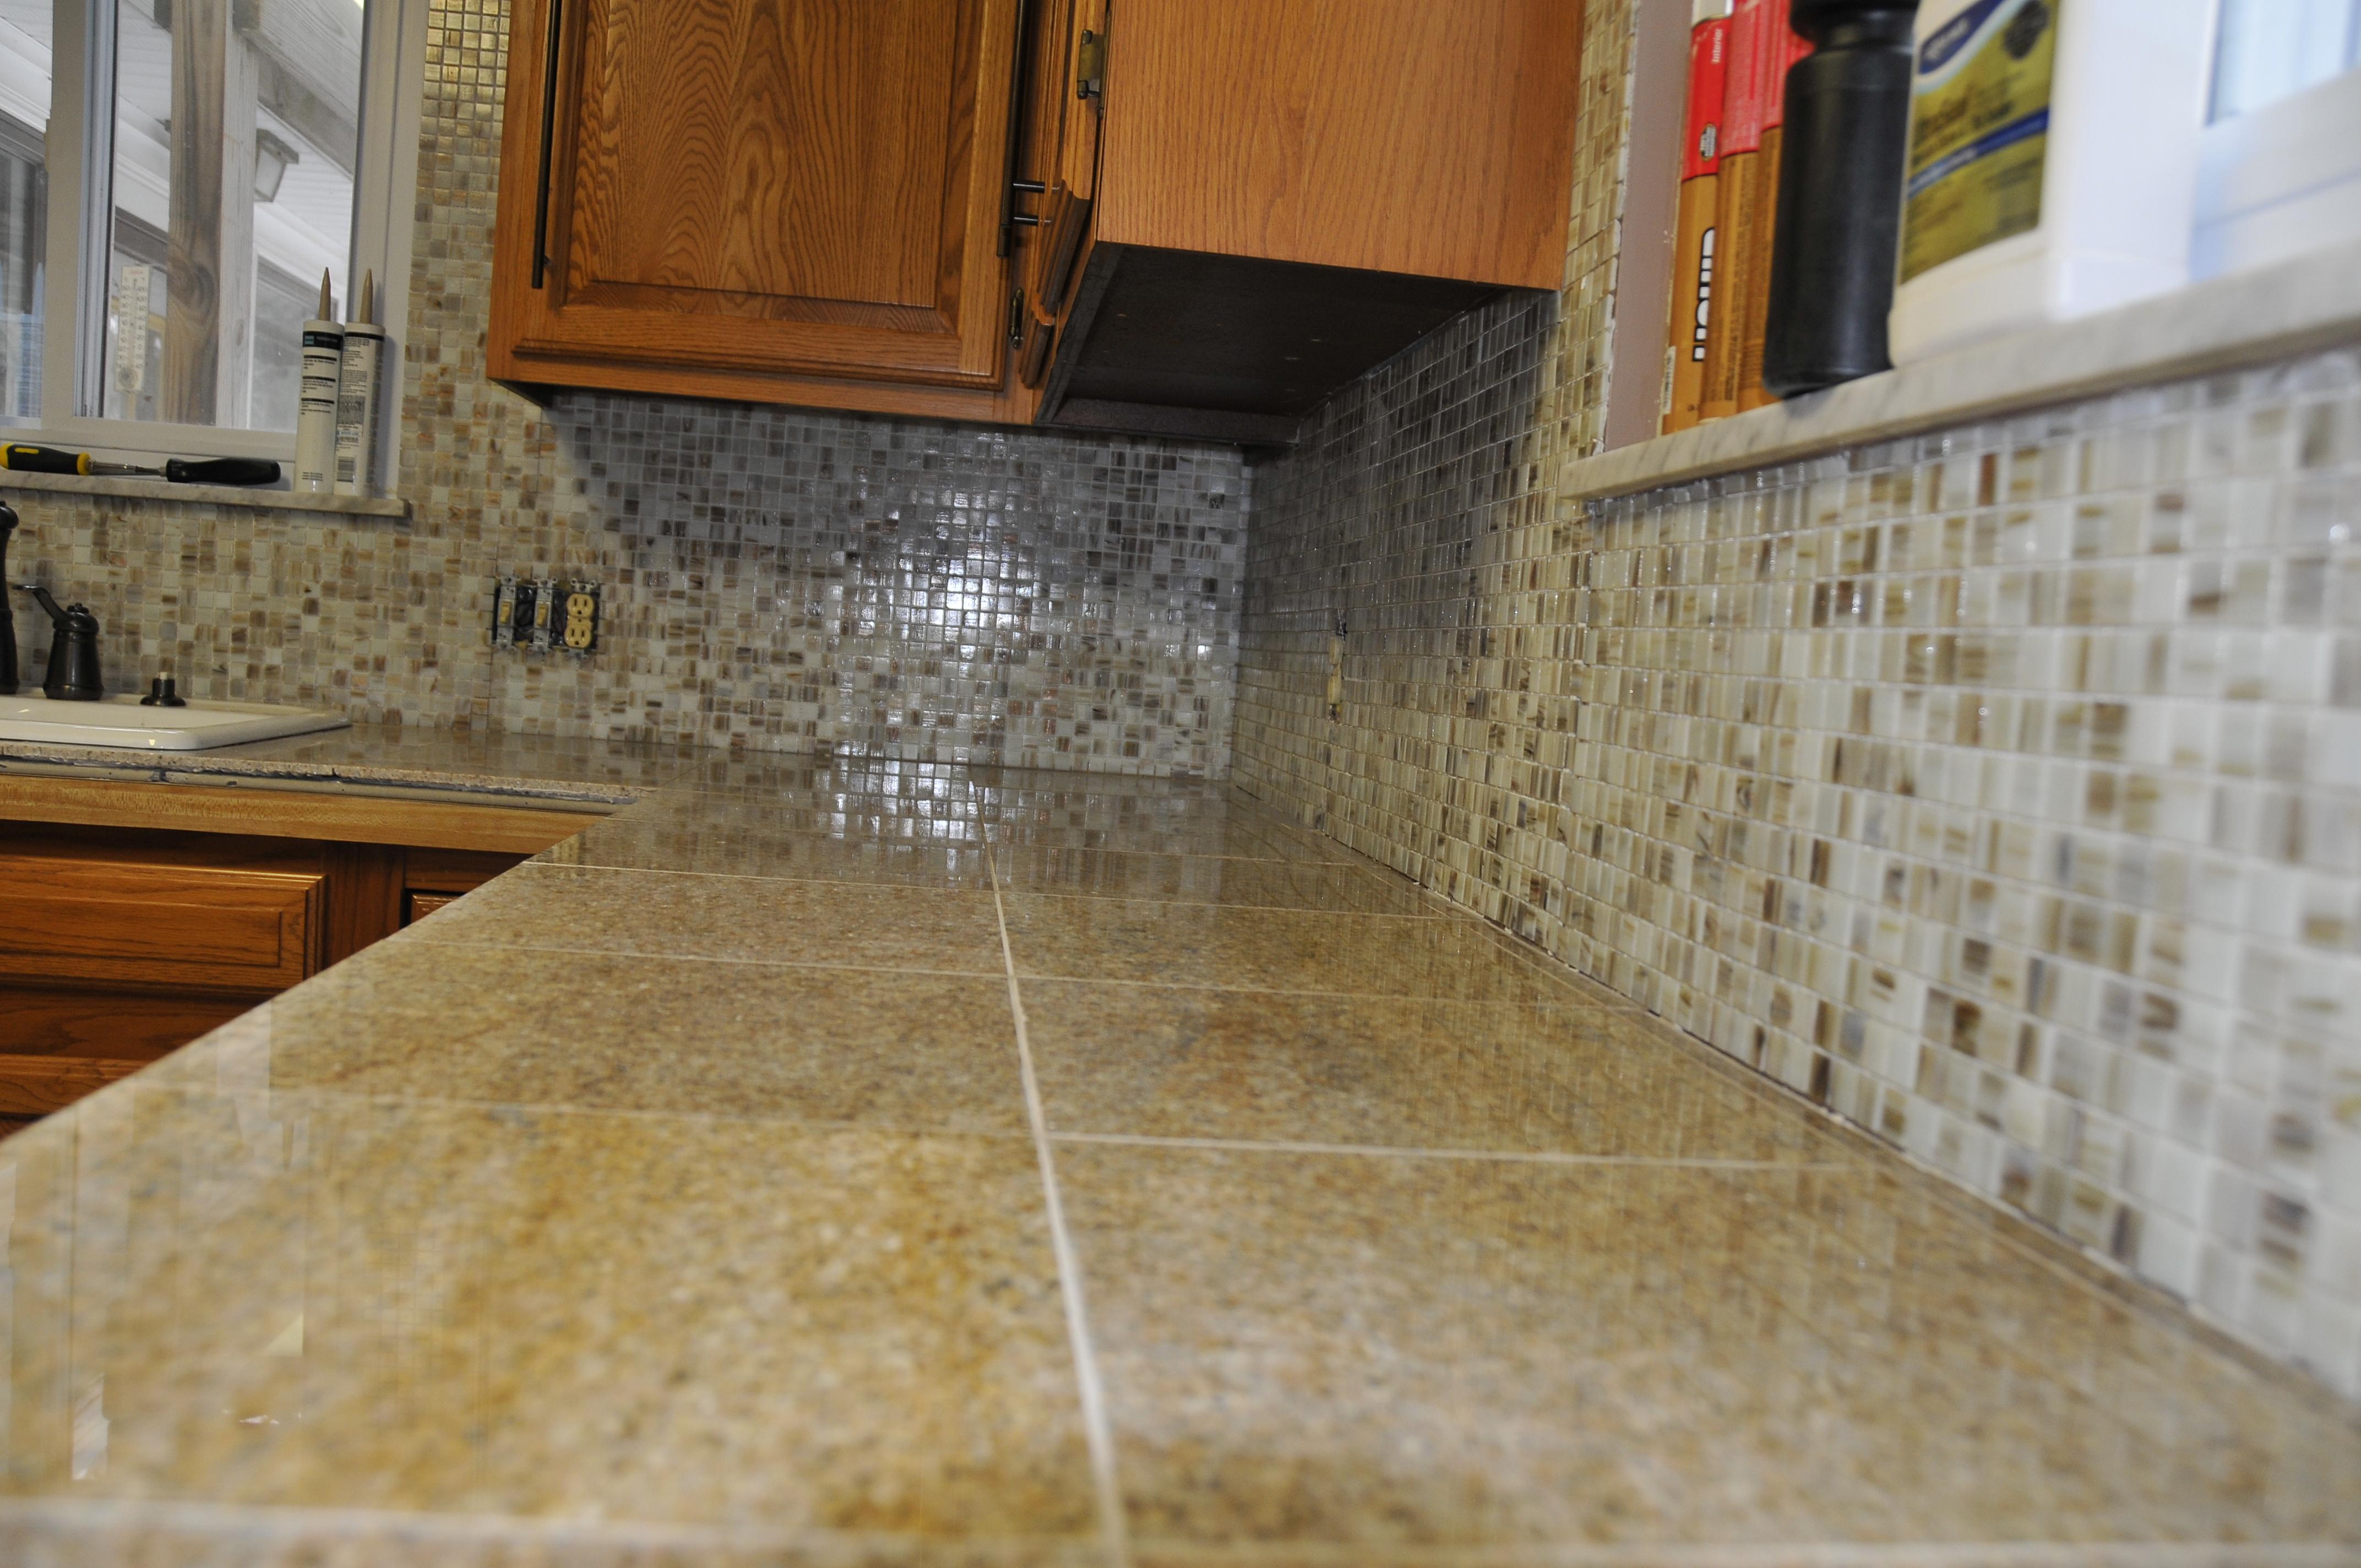 Glass Tile Backsplash with Granite